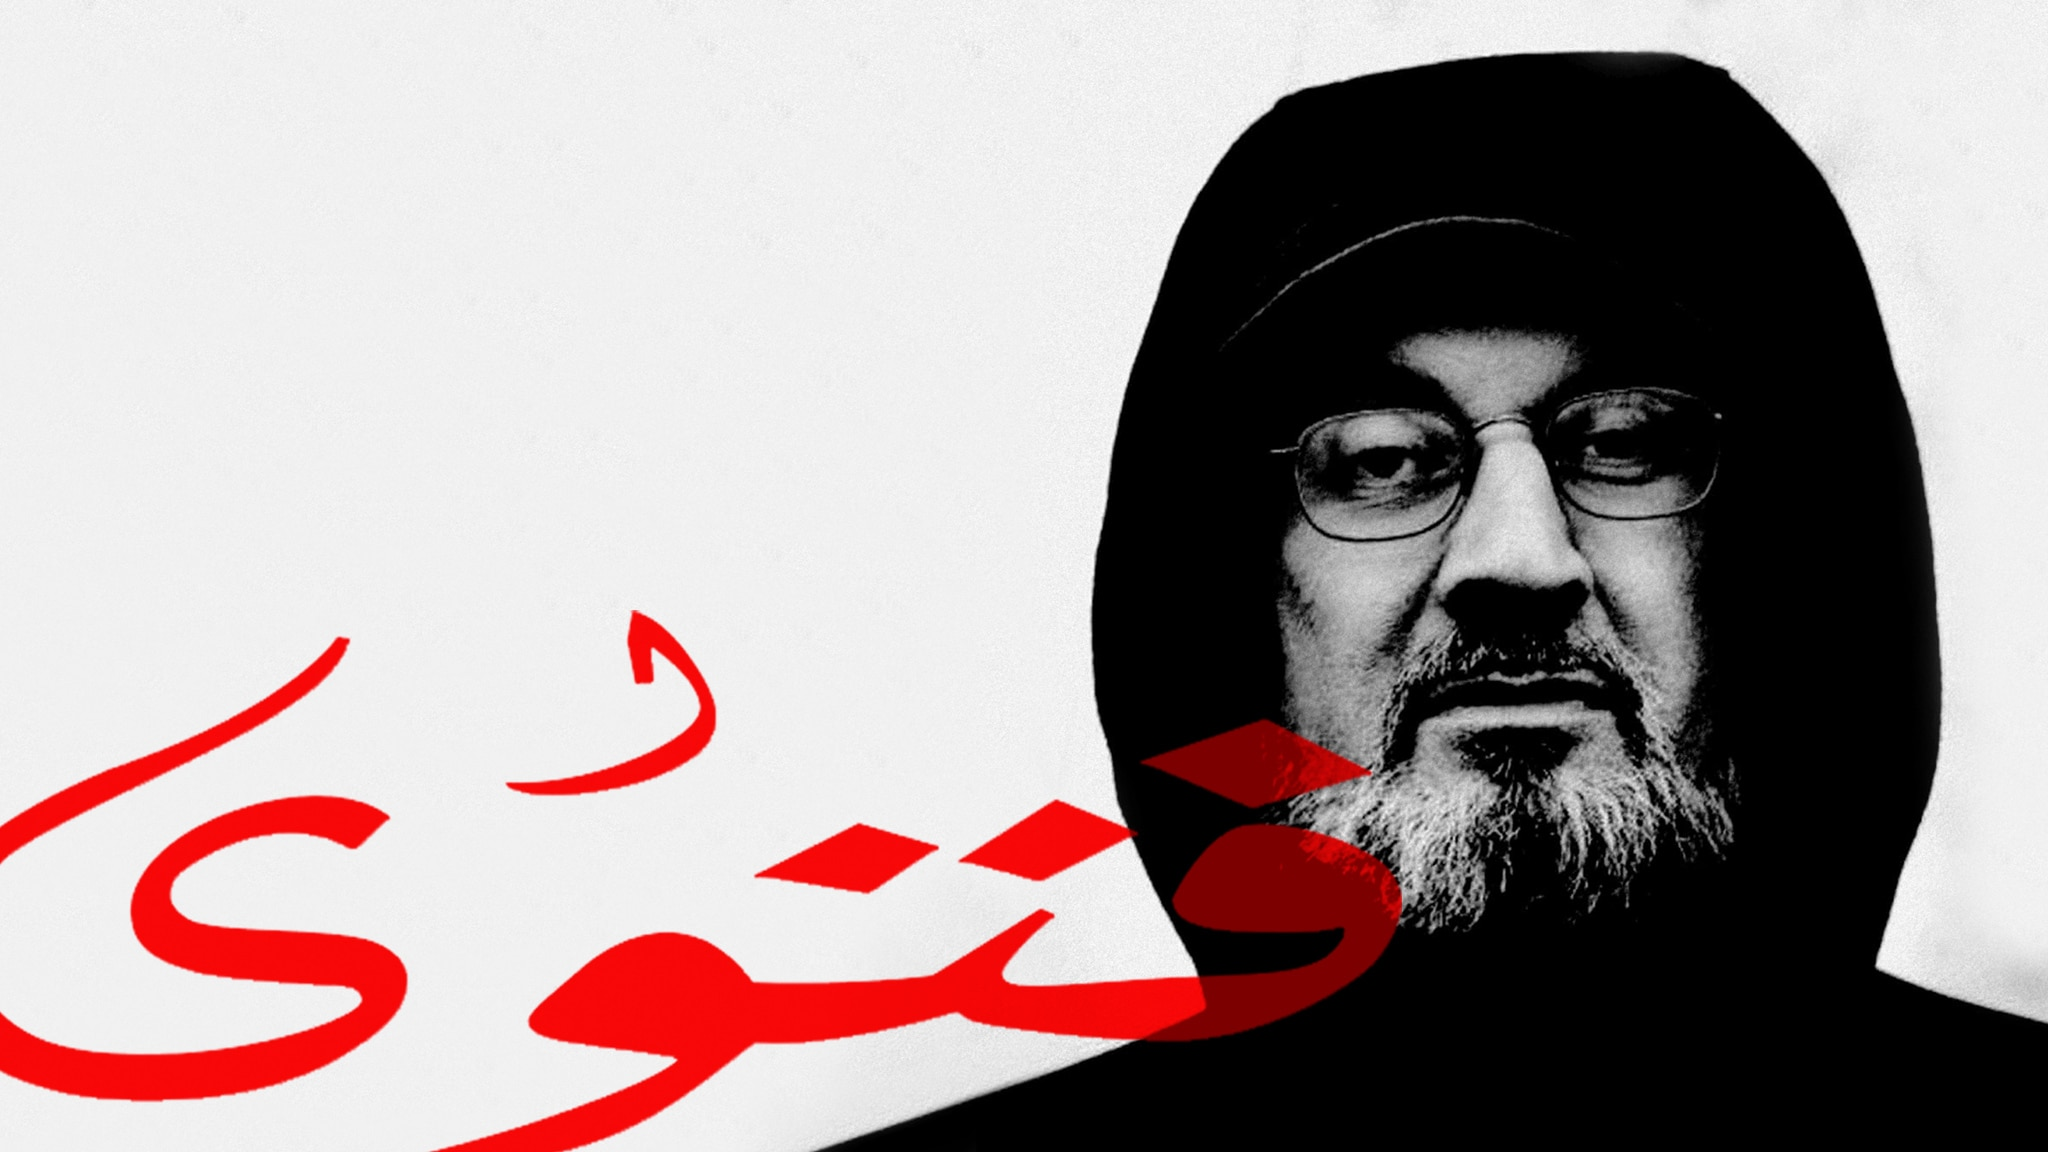 Rai 5 Salman Rushdie - Intrigo internazionale